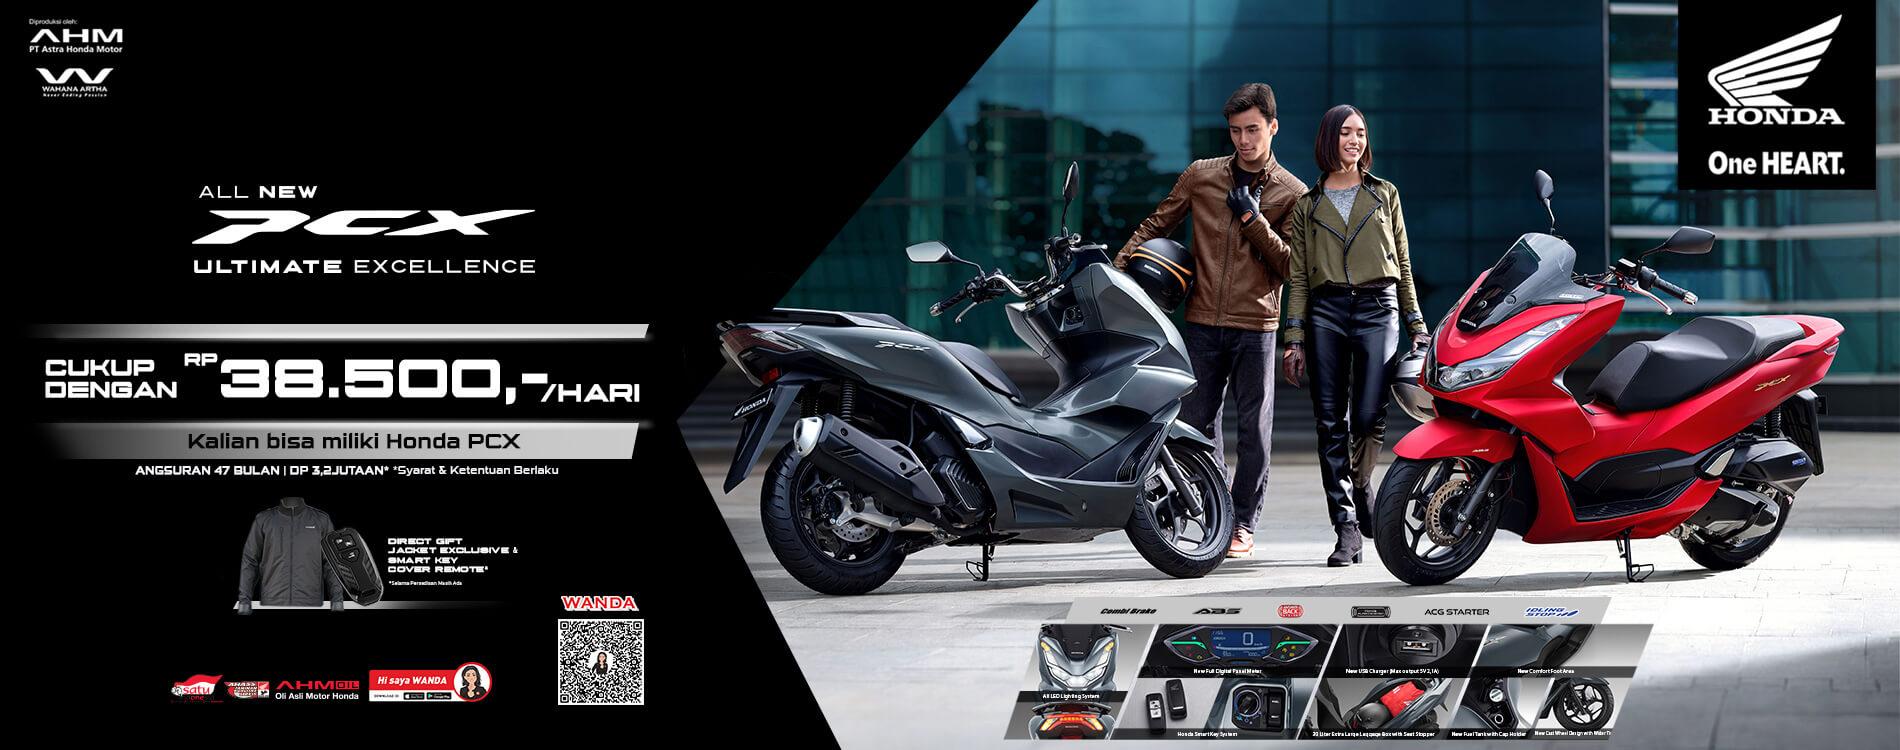 Promo All New Honda PCX 160